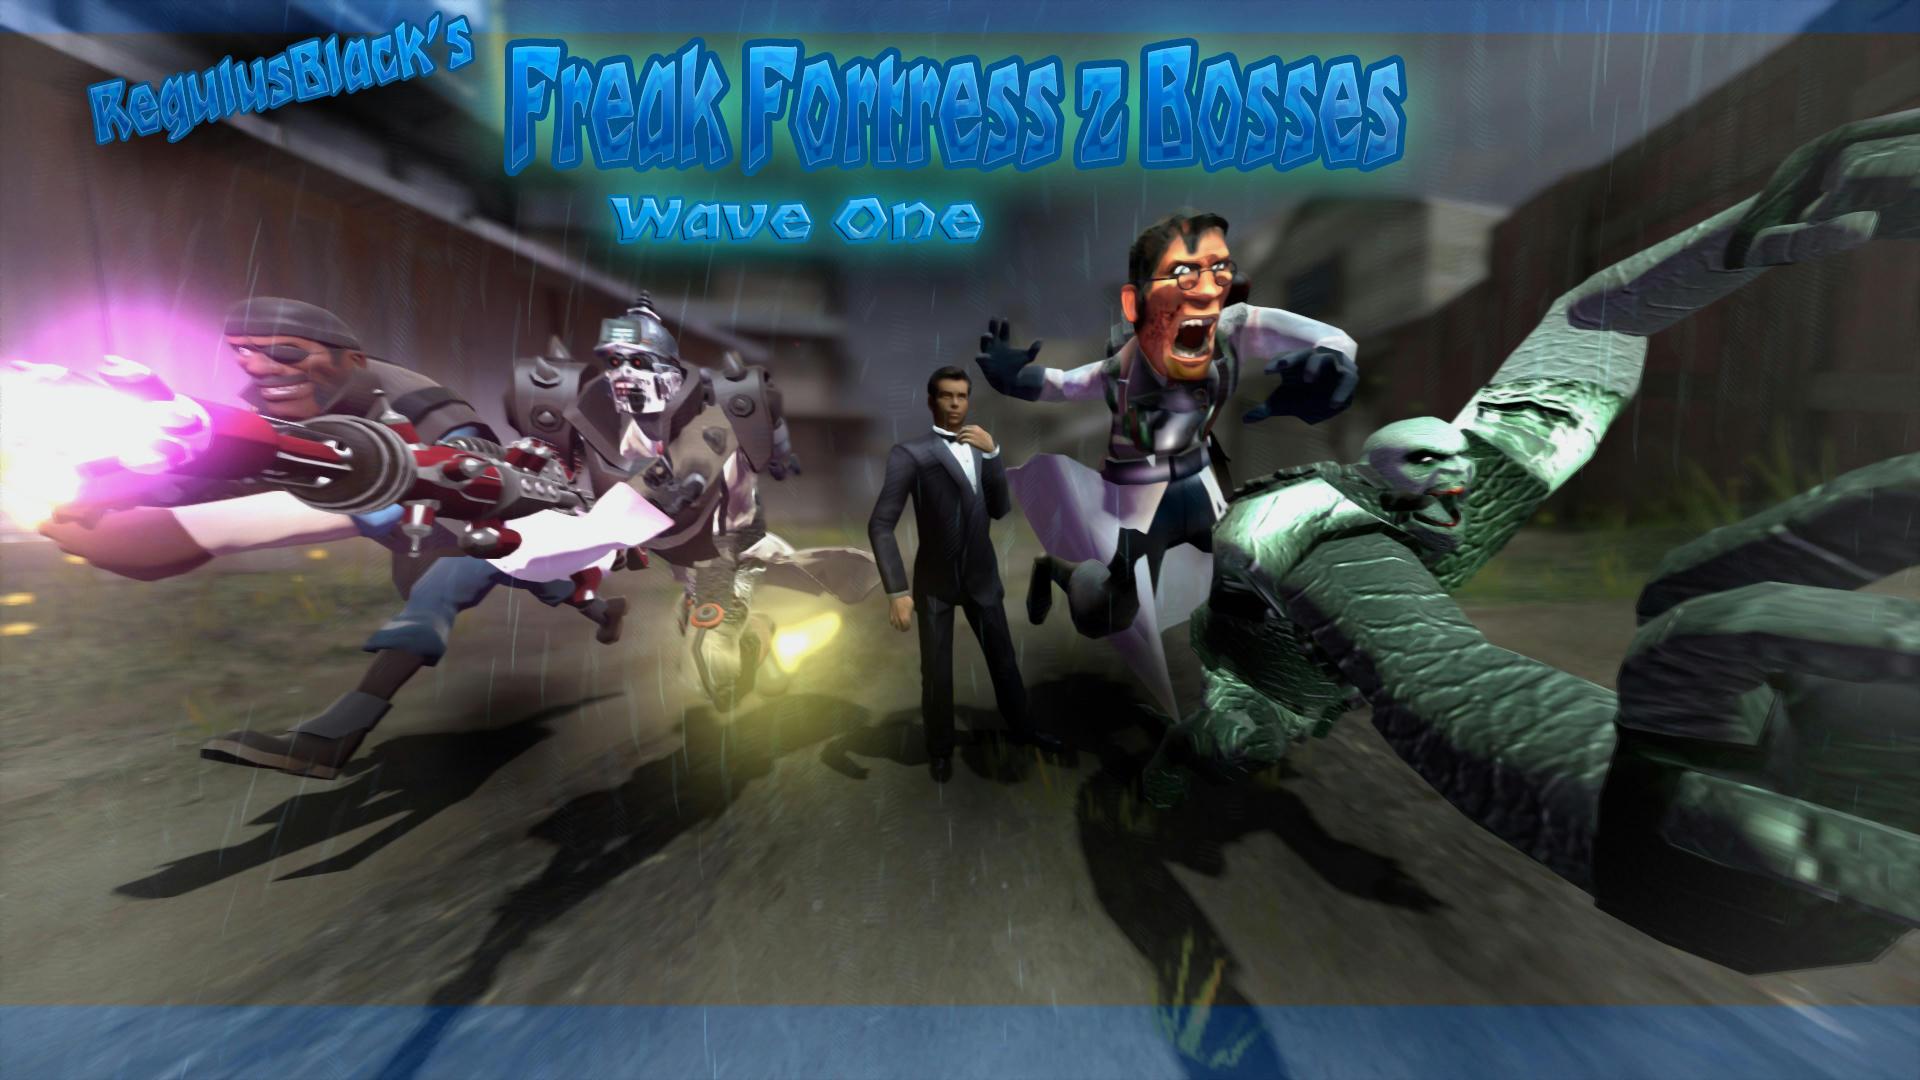 FF2] RegulusBlack's Freak Fortress 2 Bosses: Wave One